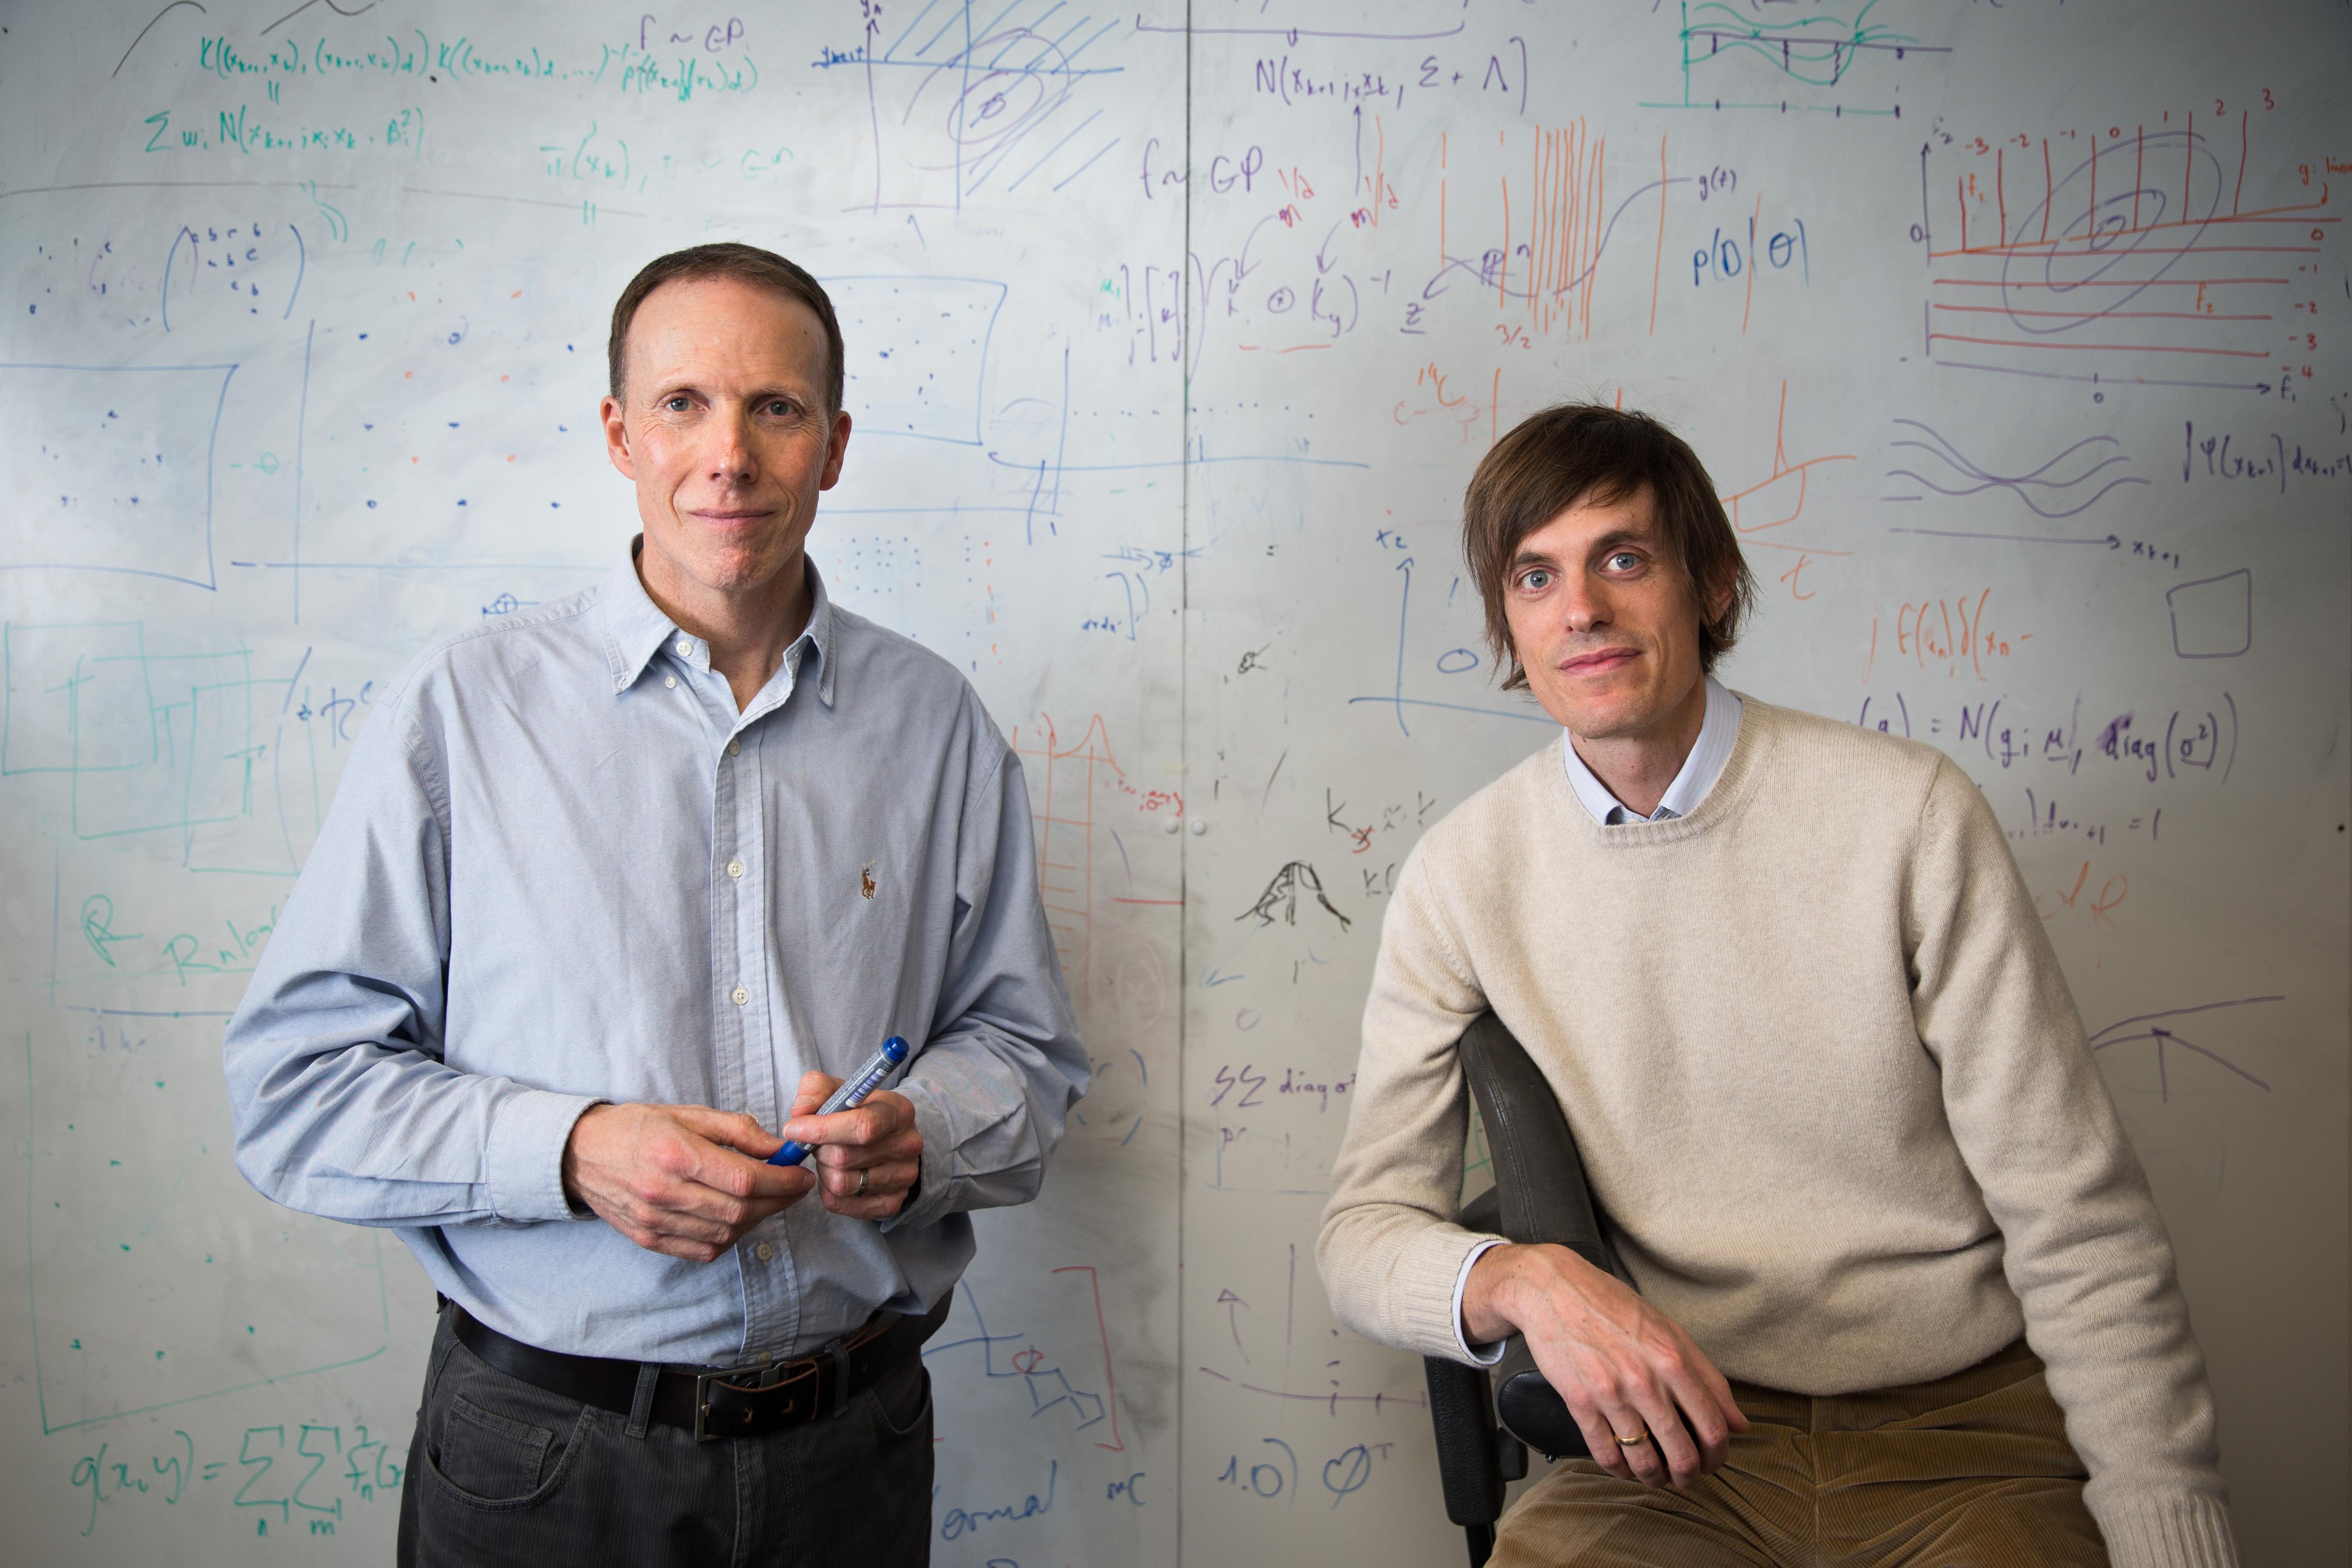 Oxford machine learning spinout unlocks big data insights